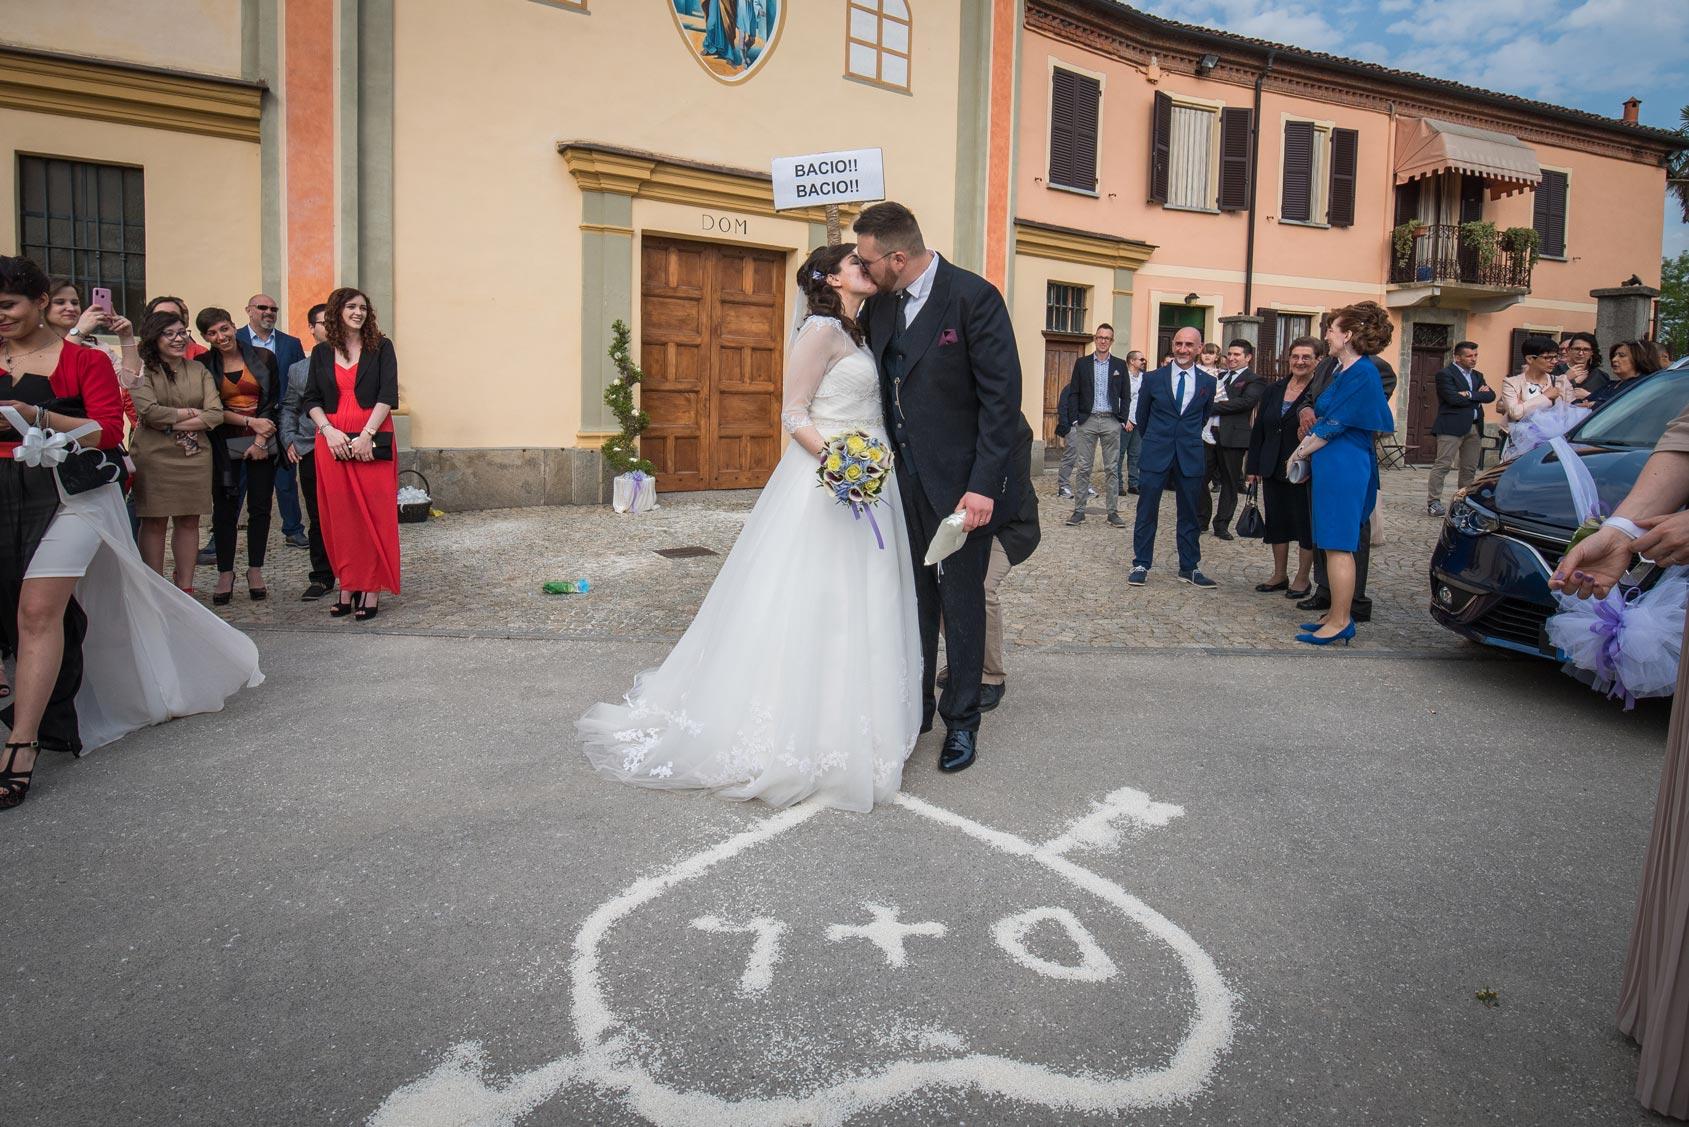 Matrimonio a Narzole Lorenza Diego - DSC 0619 - Fotografie matrimonio bacio - Fotografie matrimonio bacio